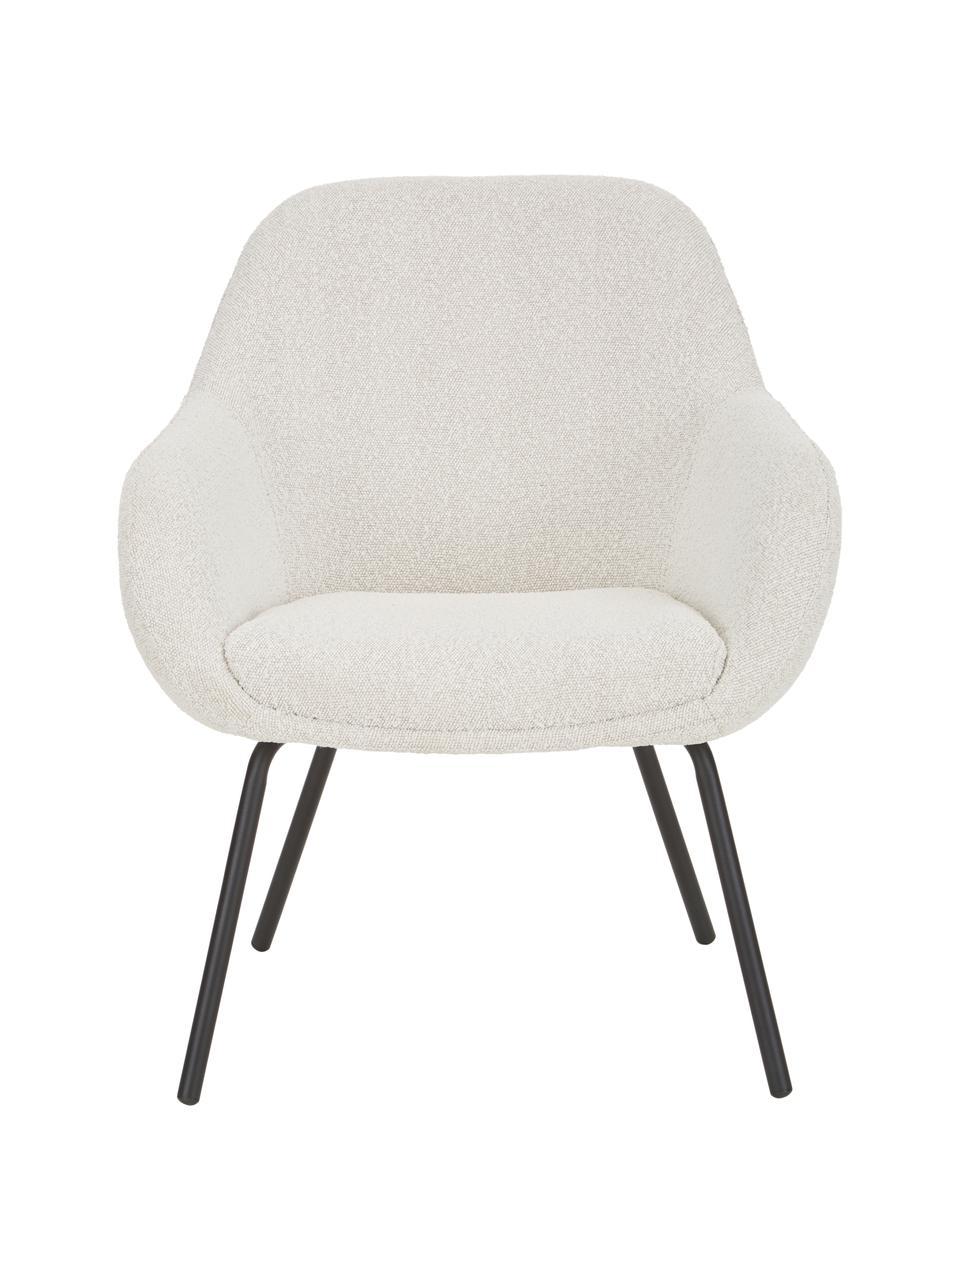 Sedia con braccioli in teddy Kassandra, Gambe: metallo verniciato a polv, Teddy bianco panna, Larg. 72 x Prof. 68 cm